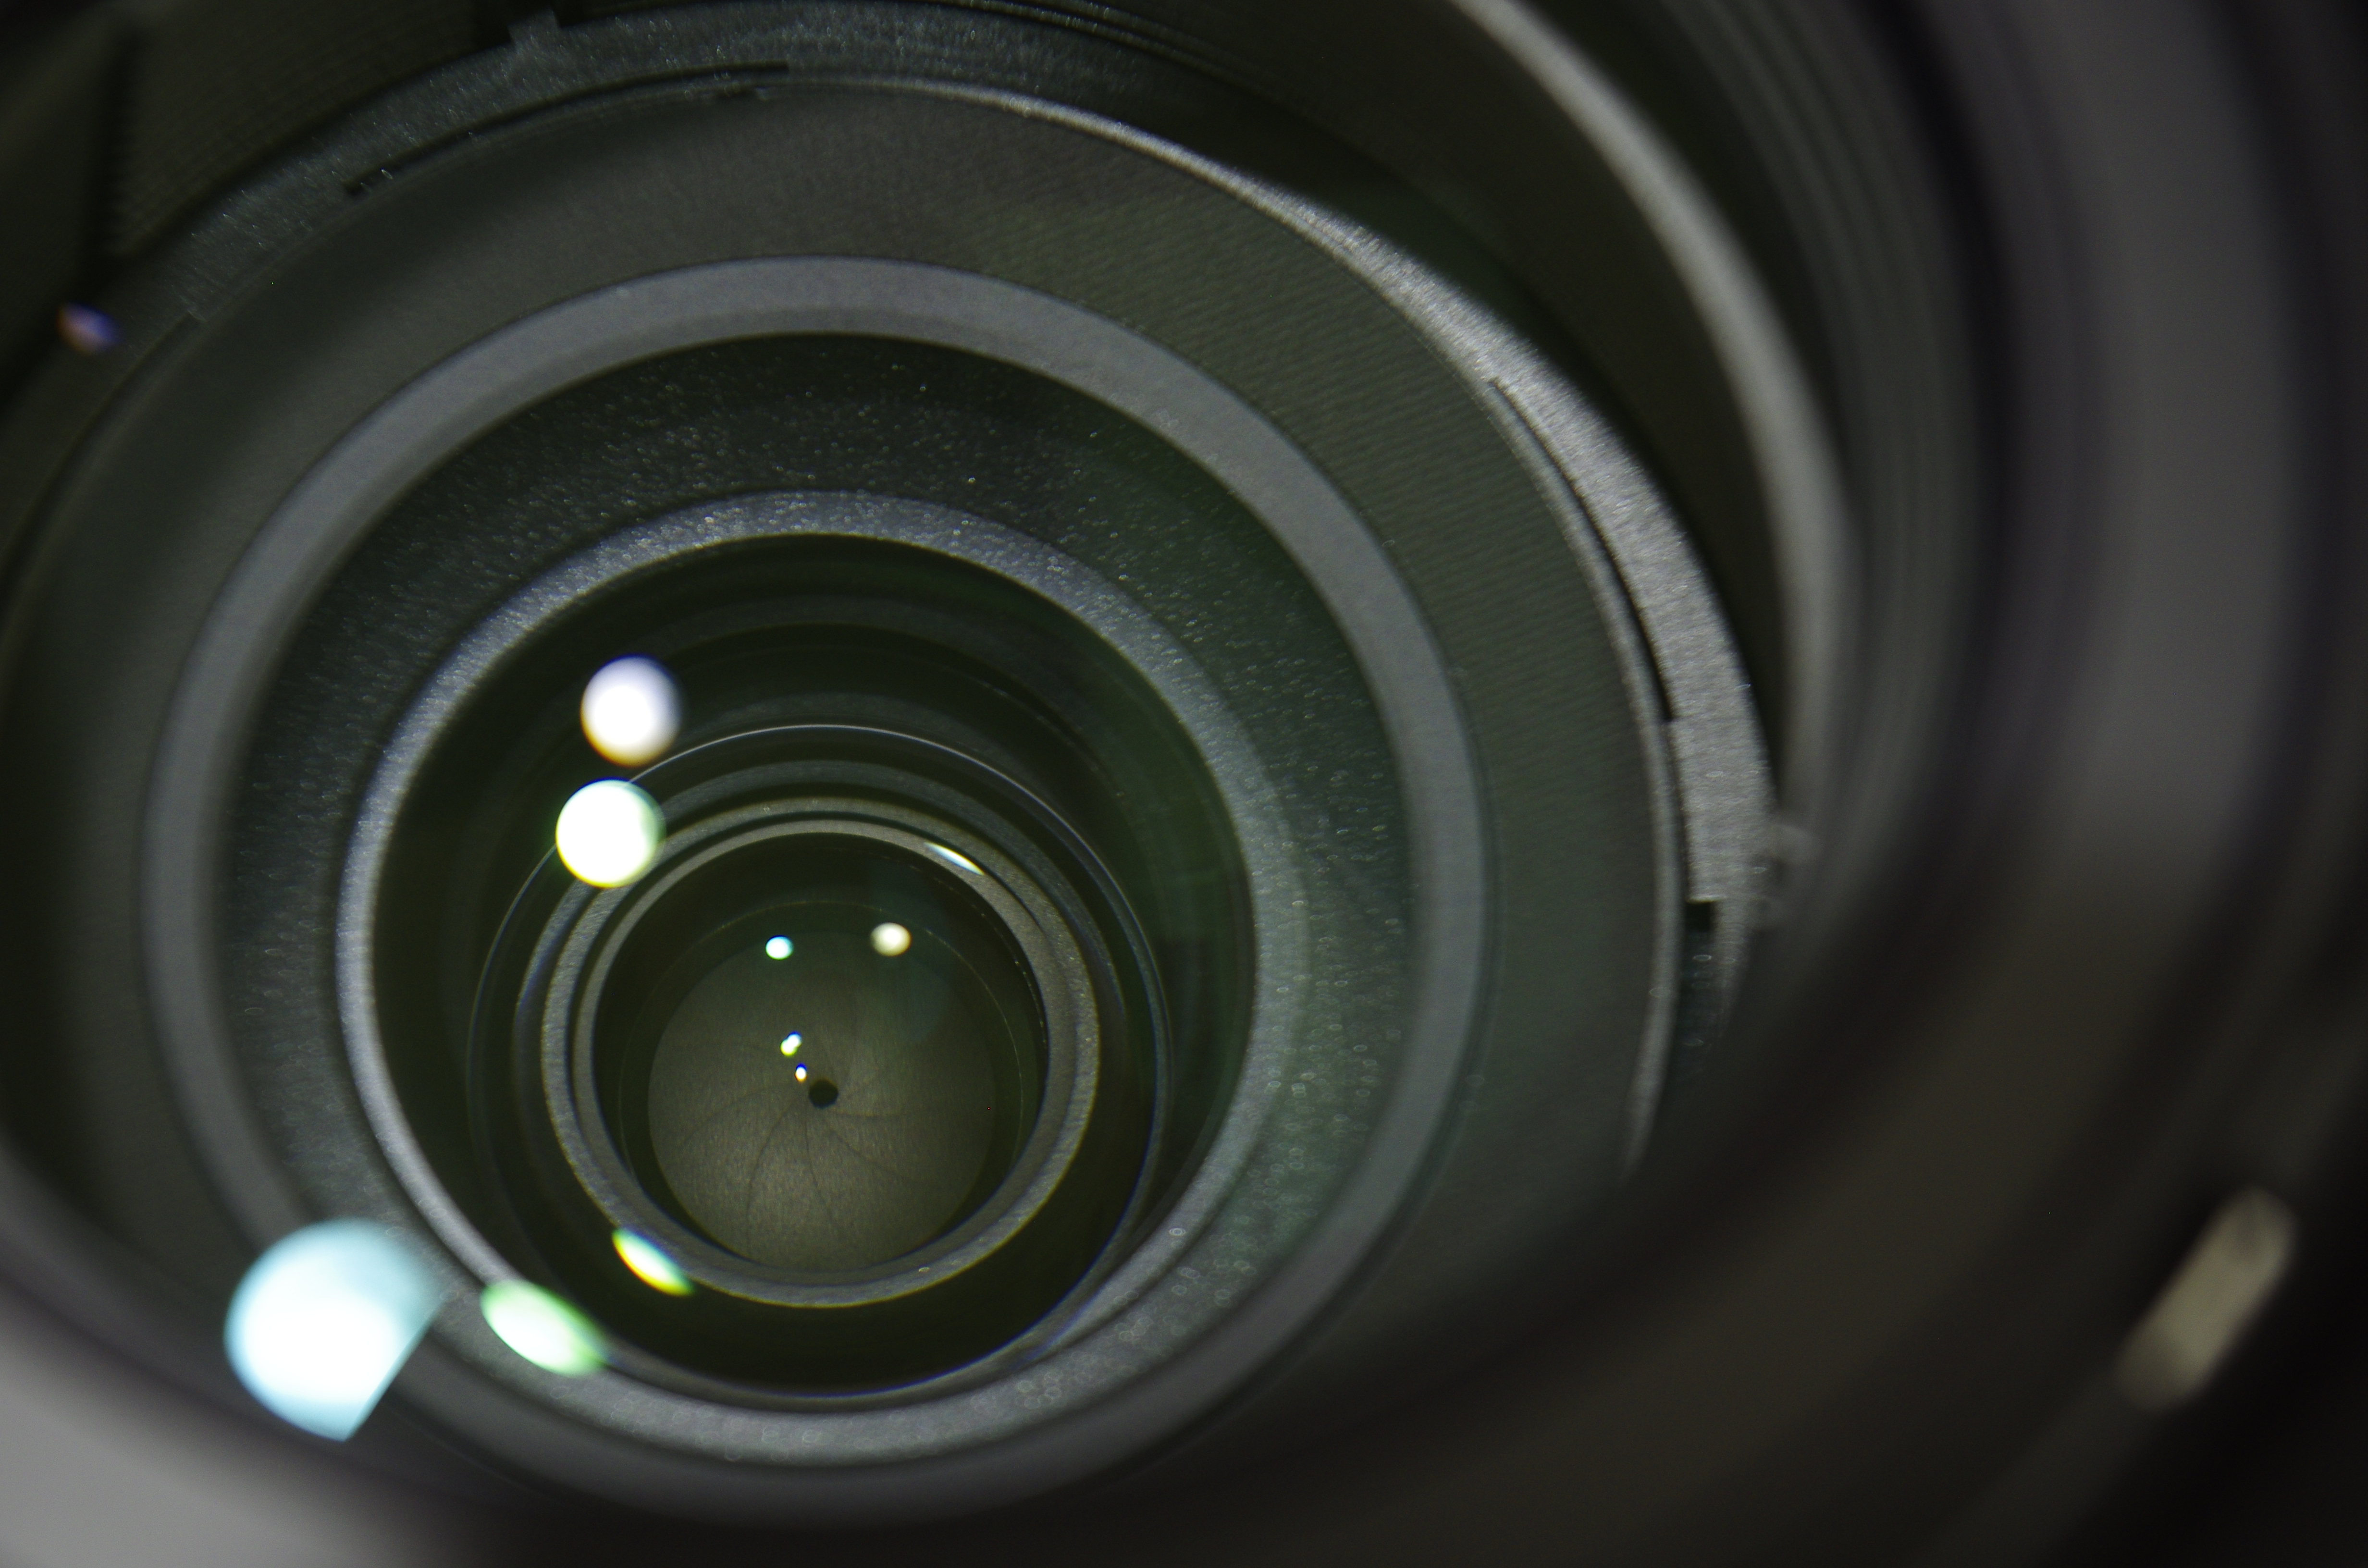 smc PENTAX DA* 16-50mm F2.8 ED AL (IF) SDM